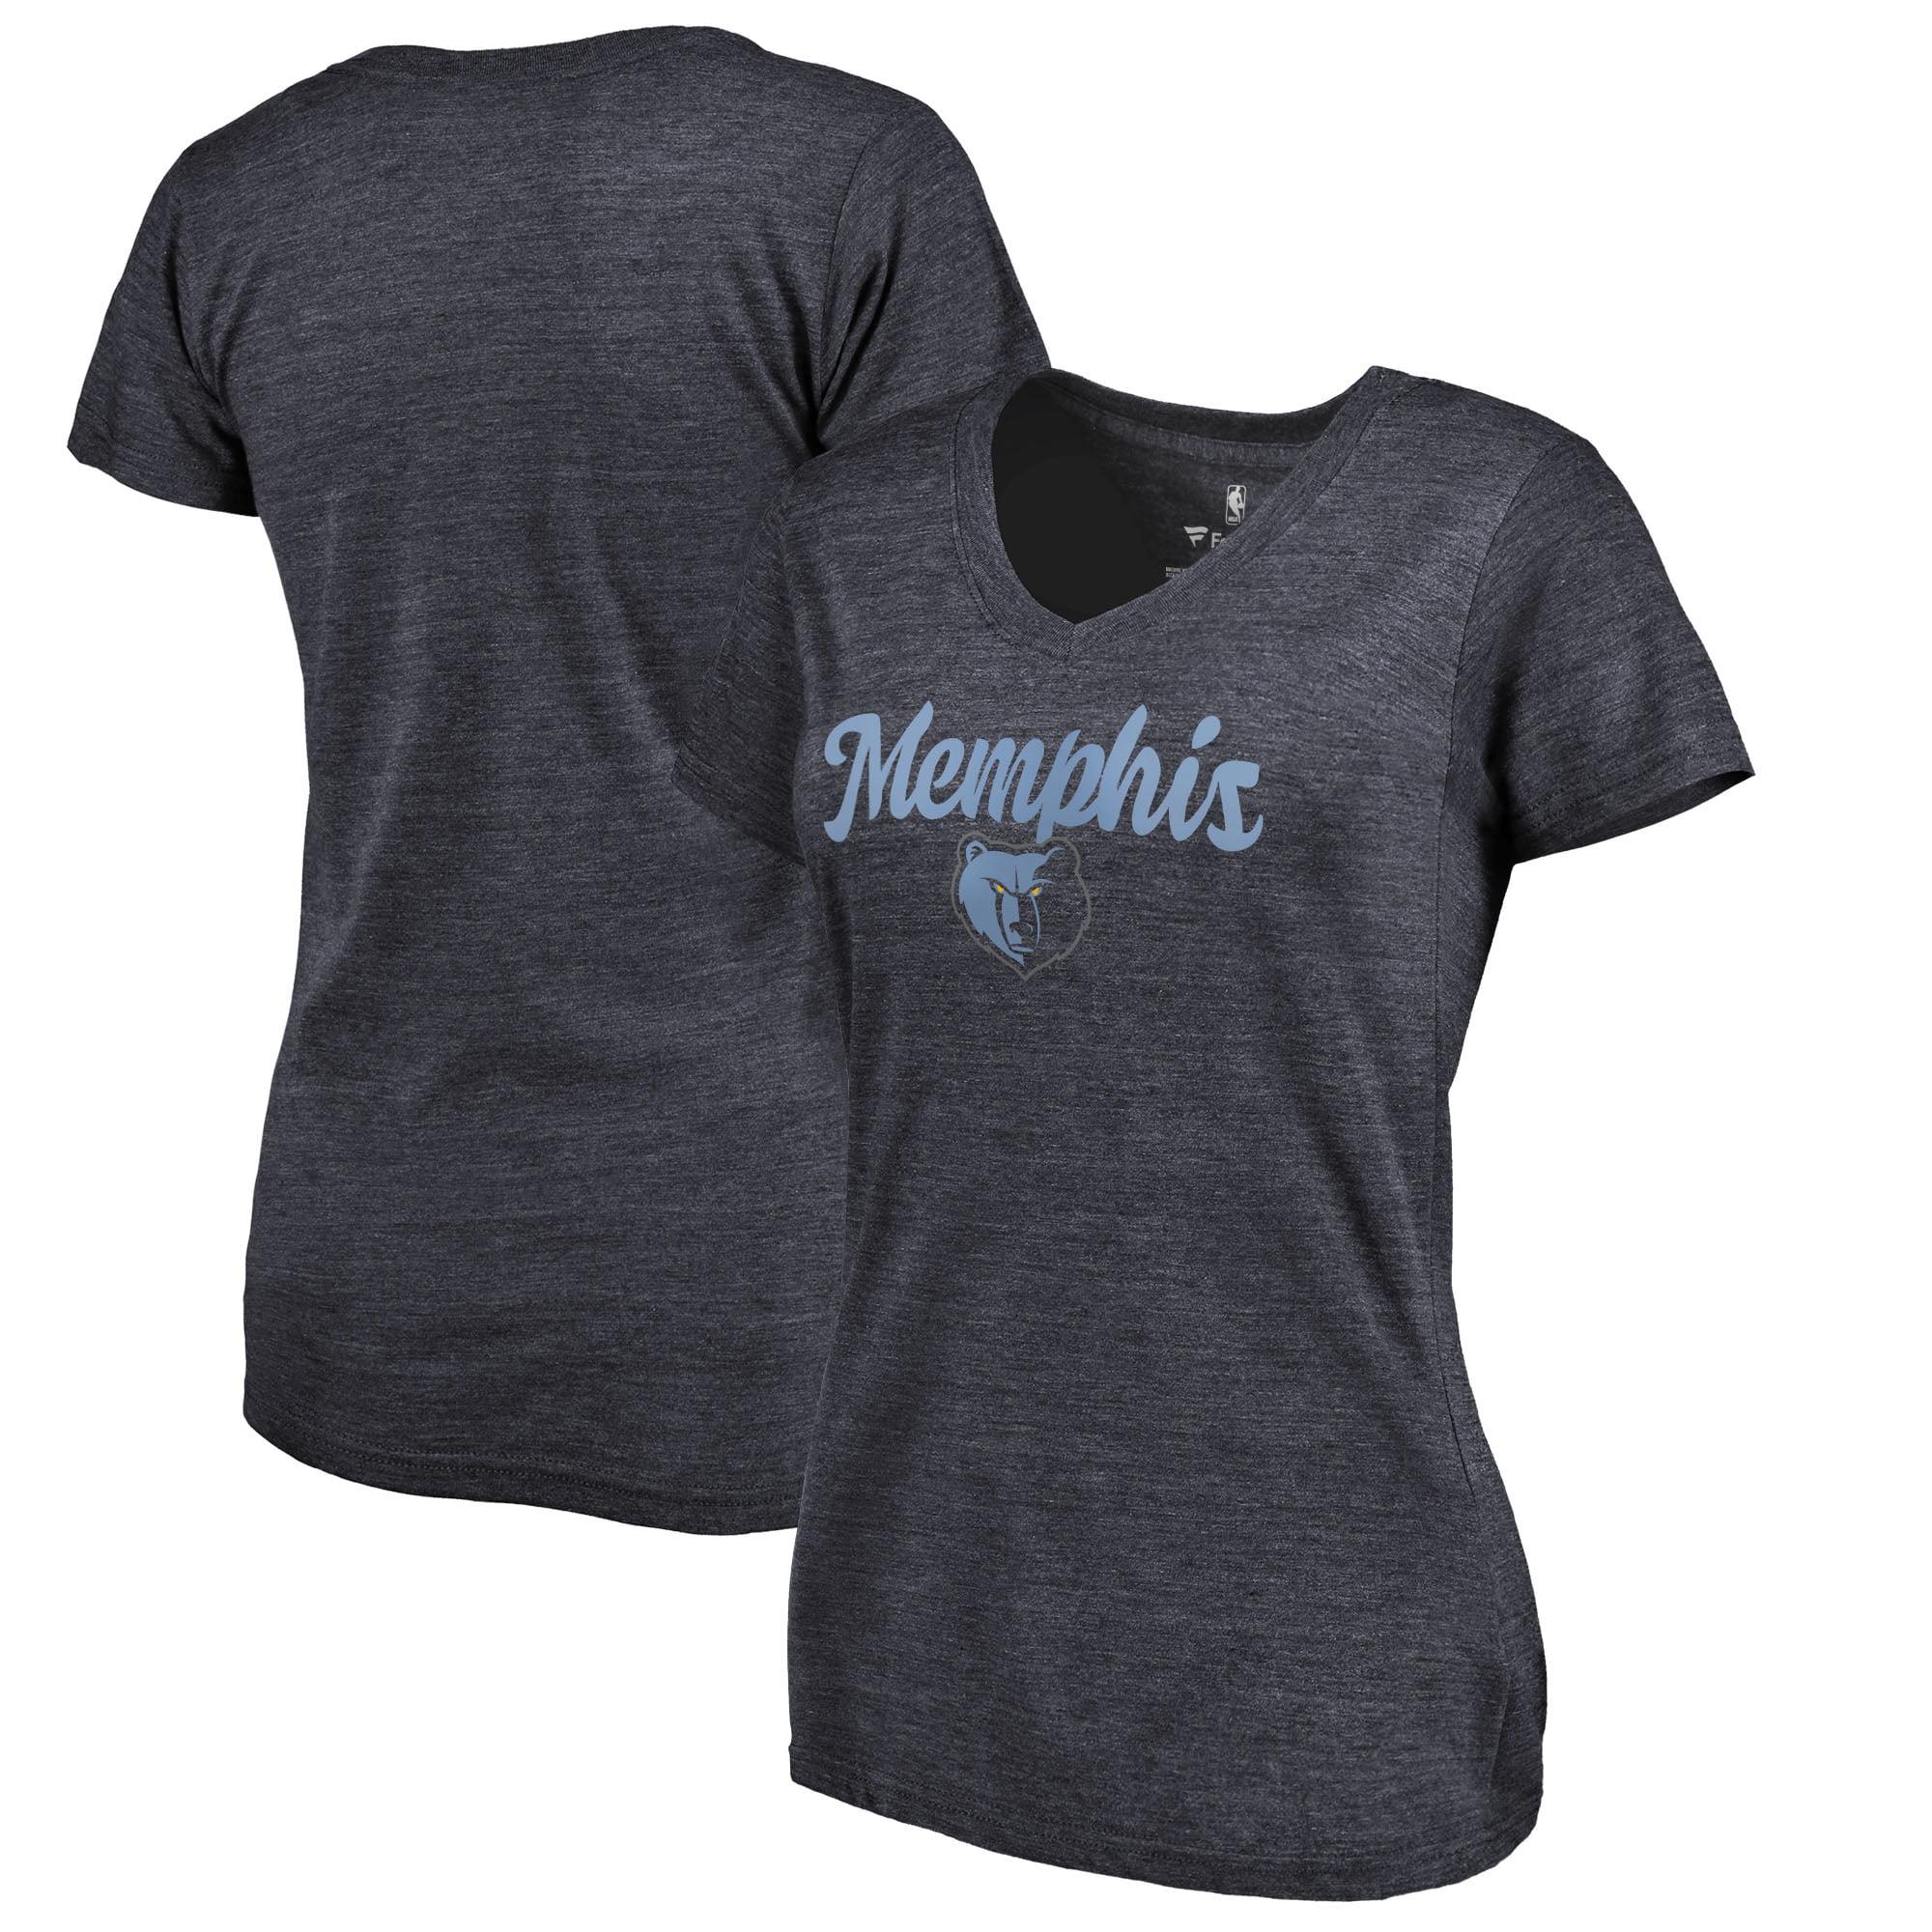 Memphis Grizzlies Women's Freehand Tri-Blend V-Neck T-Shirt - Navy